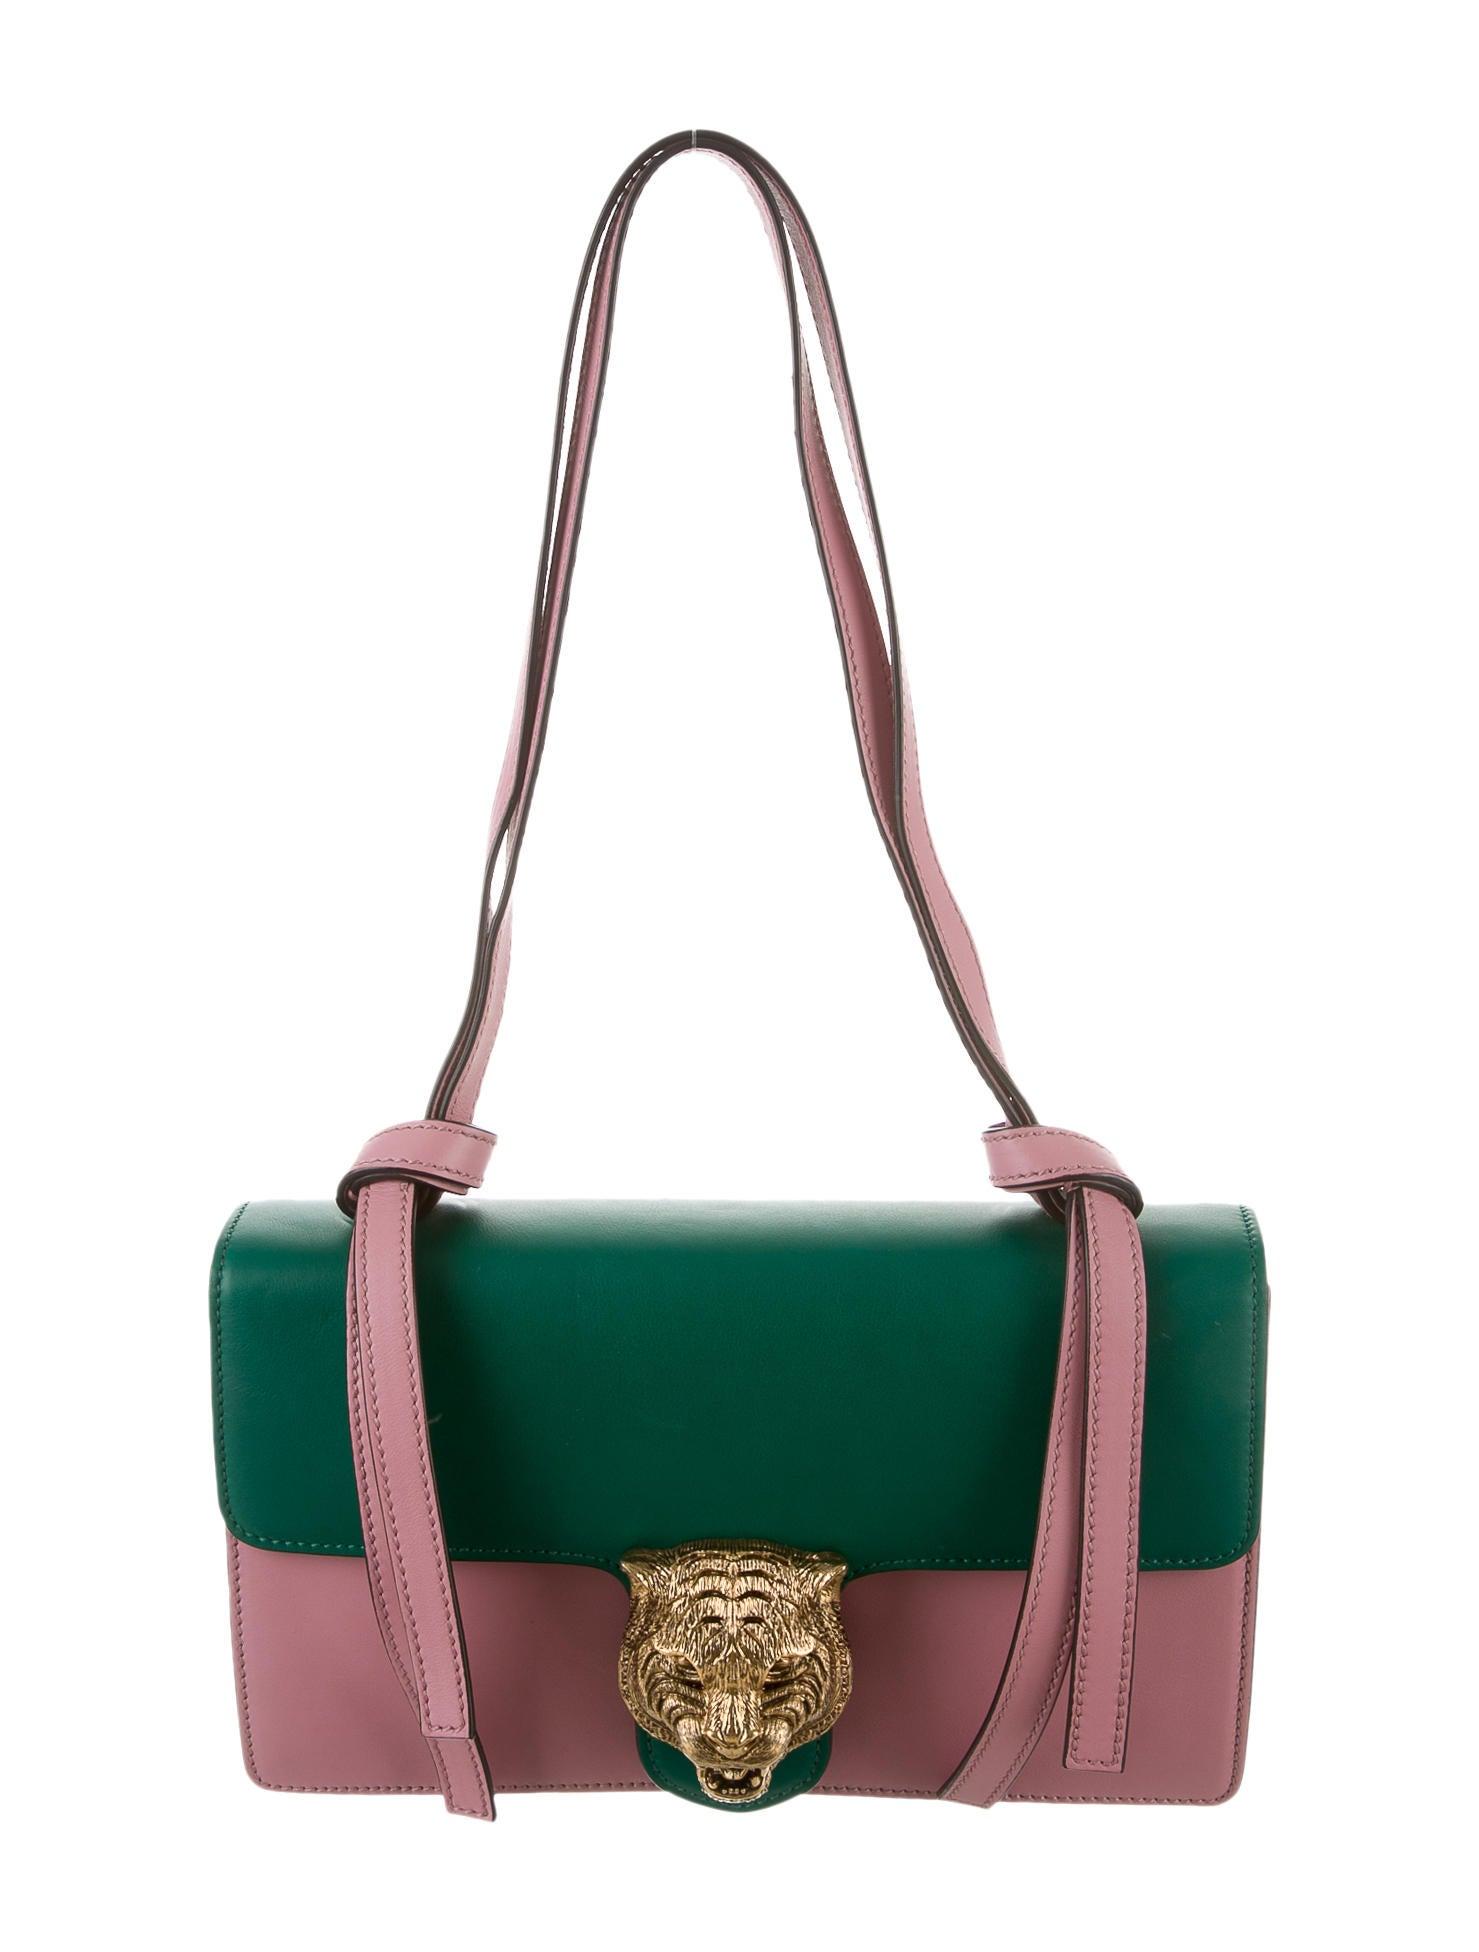 d9fc34623fbaa5 Gucci Animalier Shoulder Bag - Handbags - GUC71875 | The RealReal